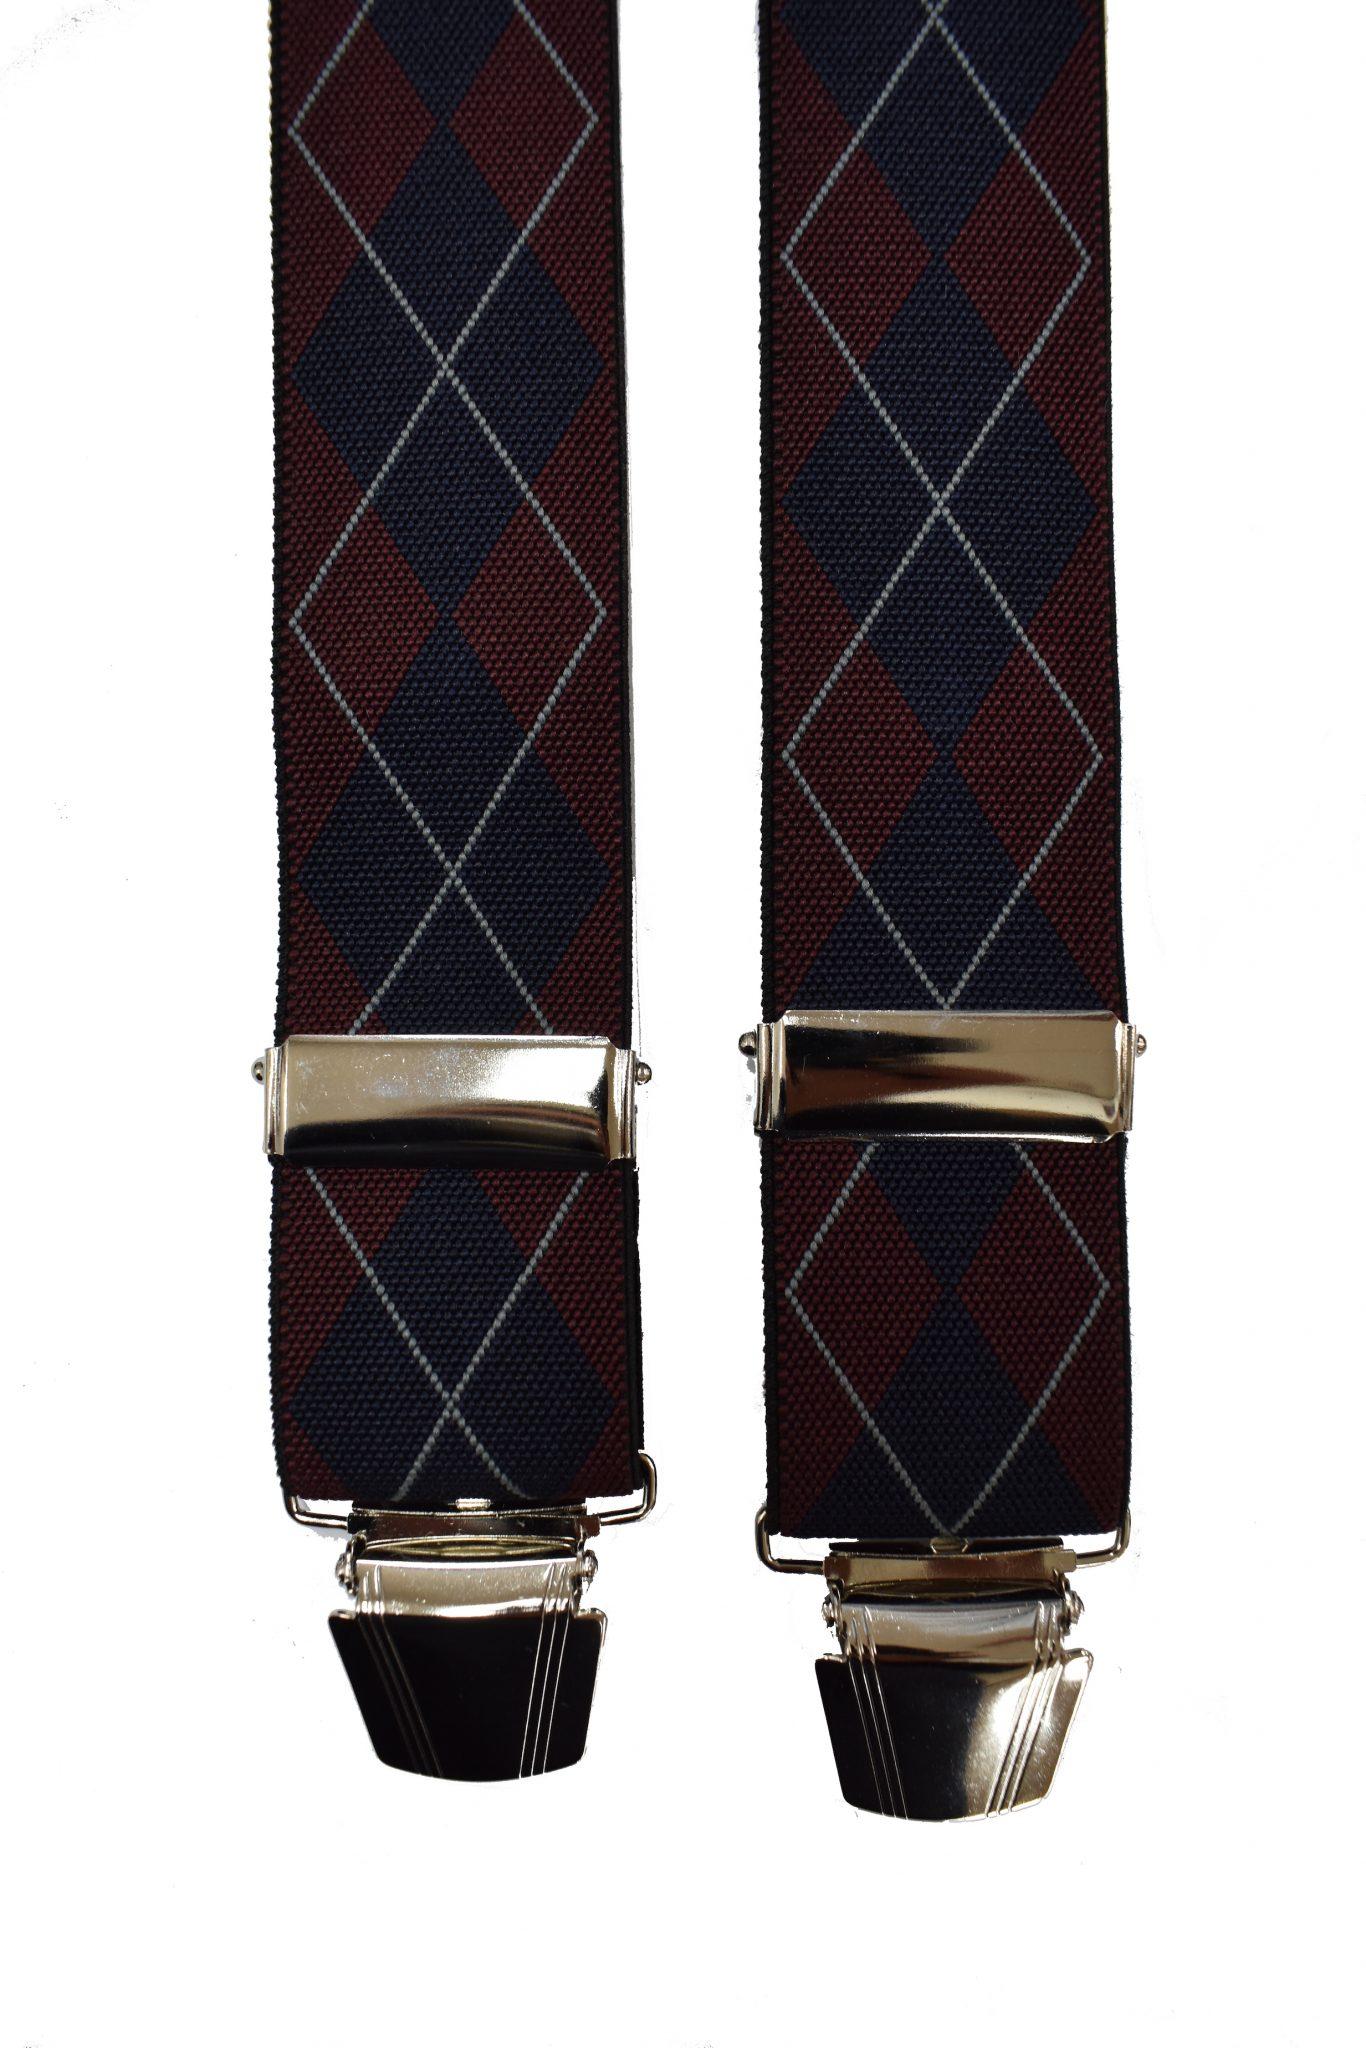 Dobrefa extra lange bretels bordeauxrood en donkerblauw diagonaal